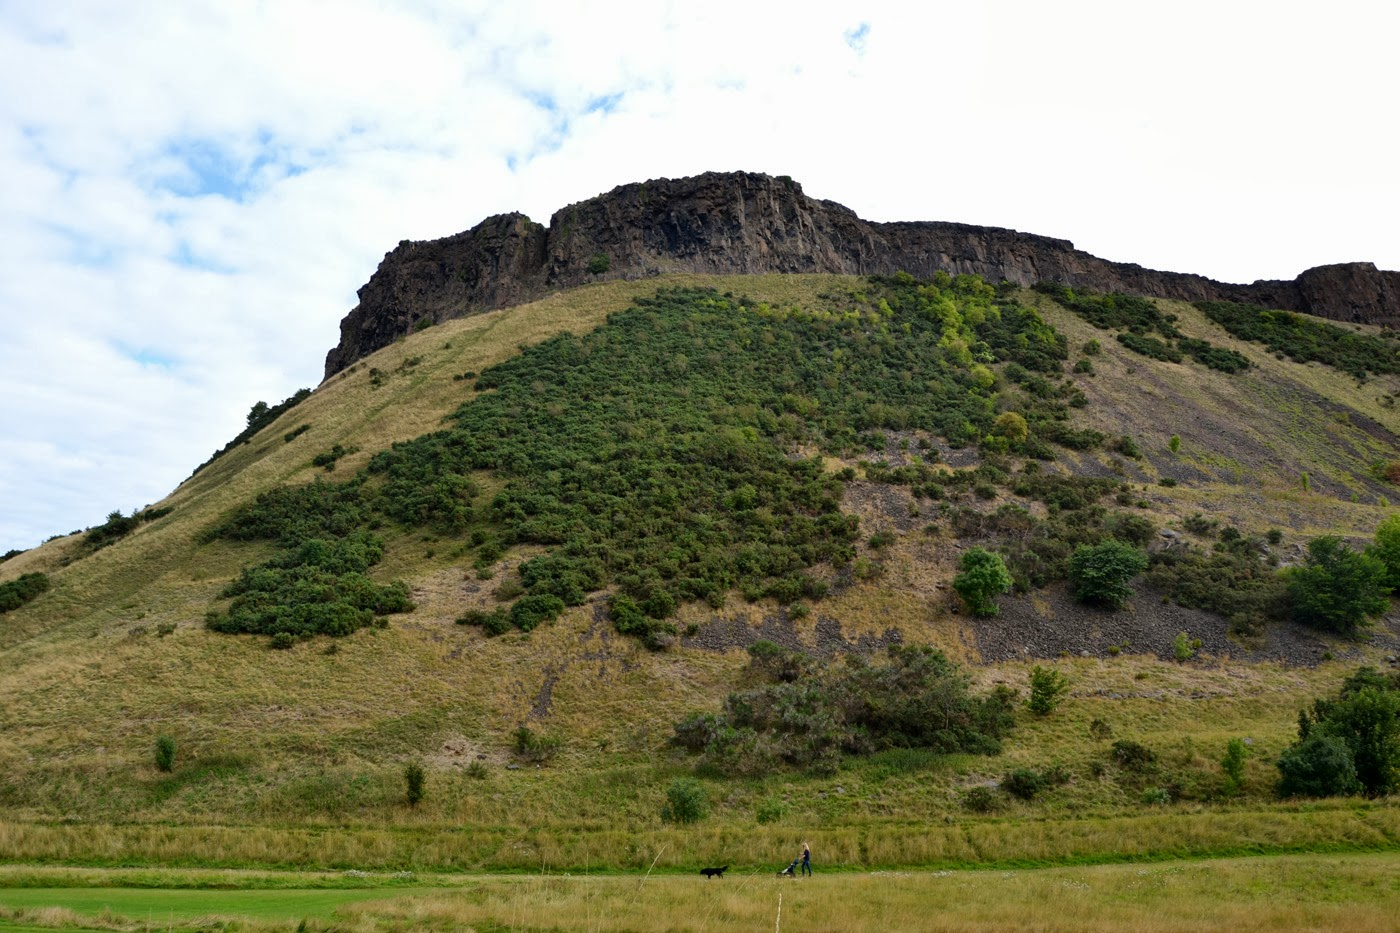 Holyrood park (Edinburgh / Scotland) by XOANYU.